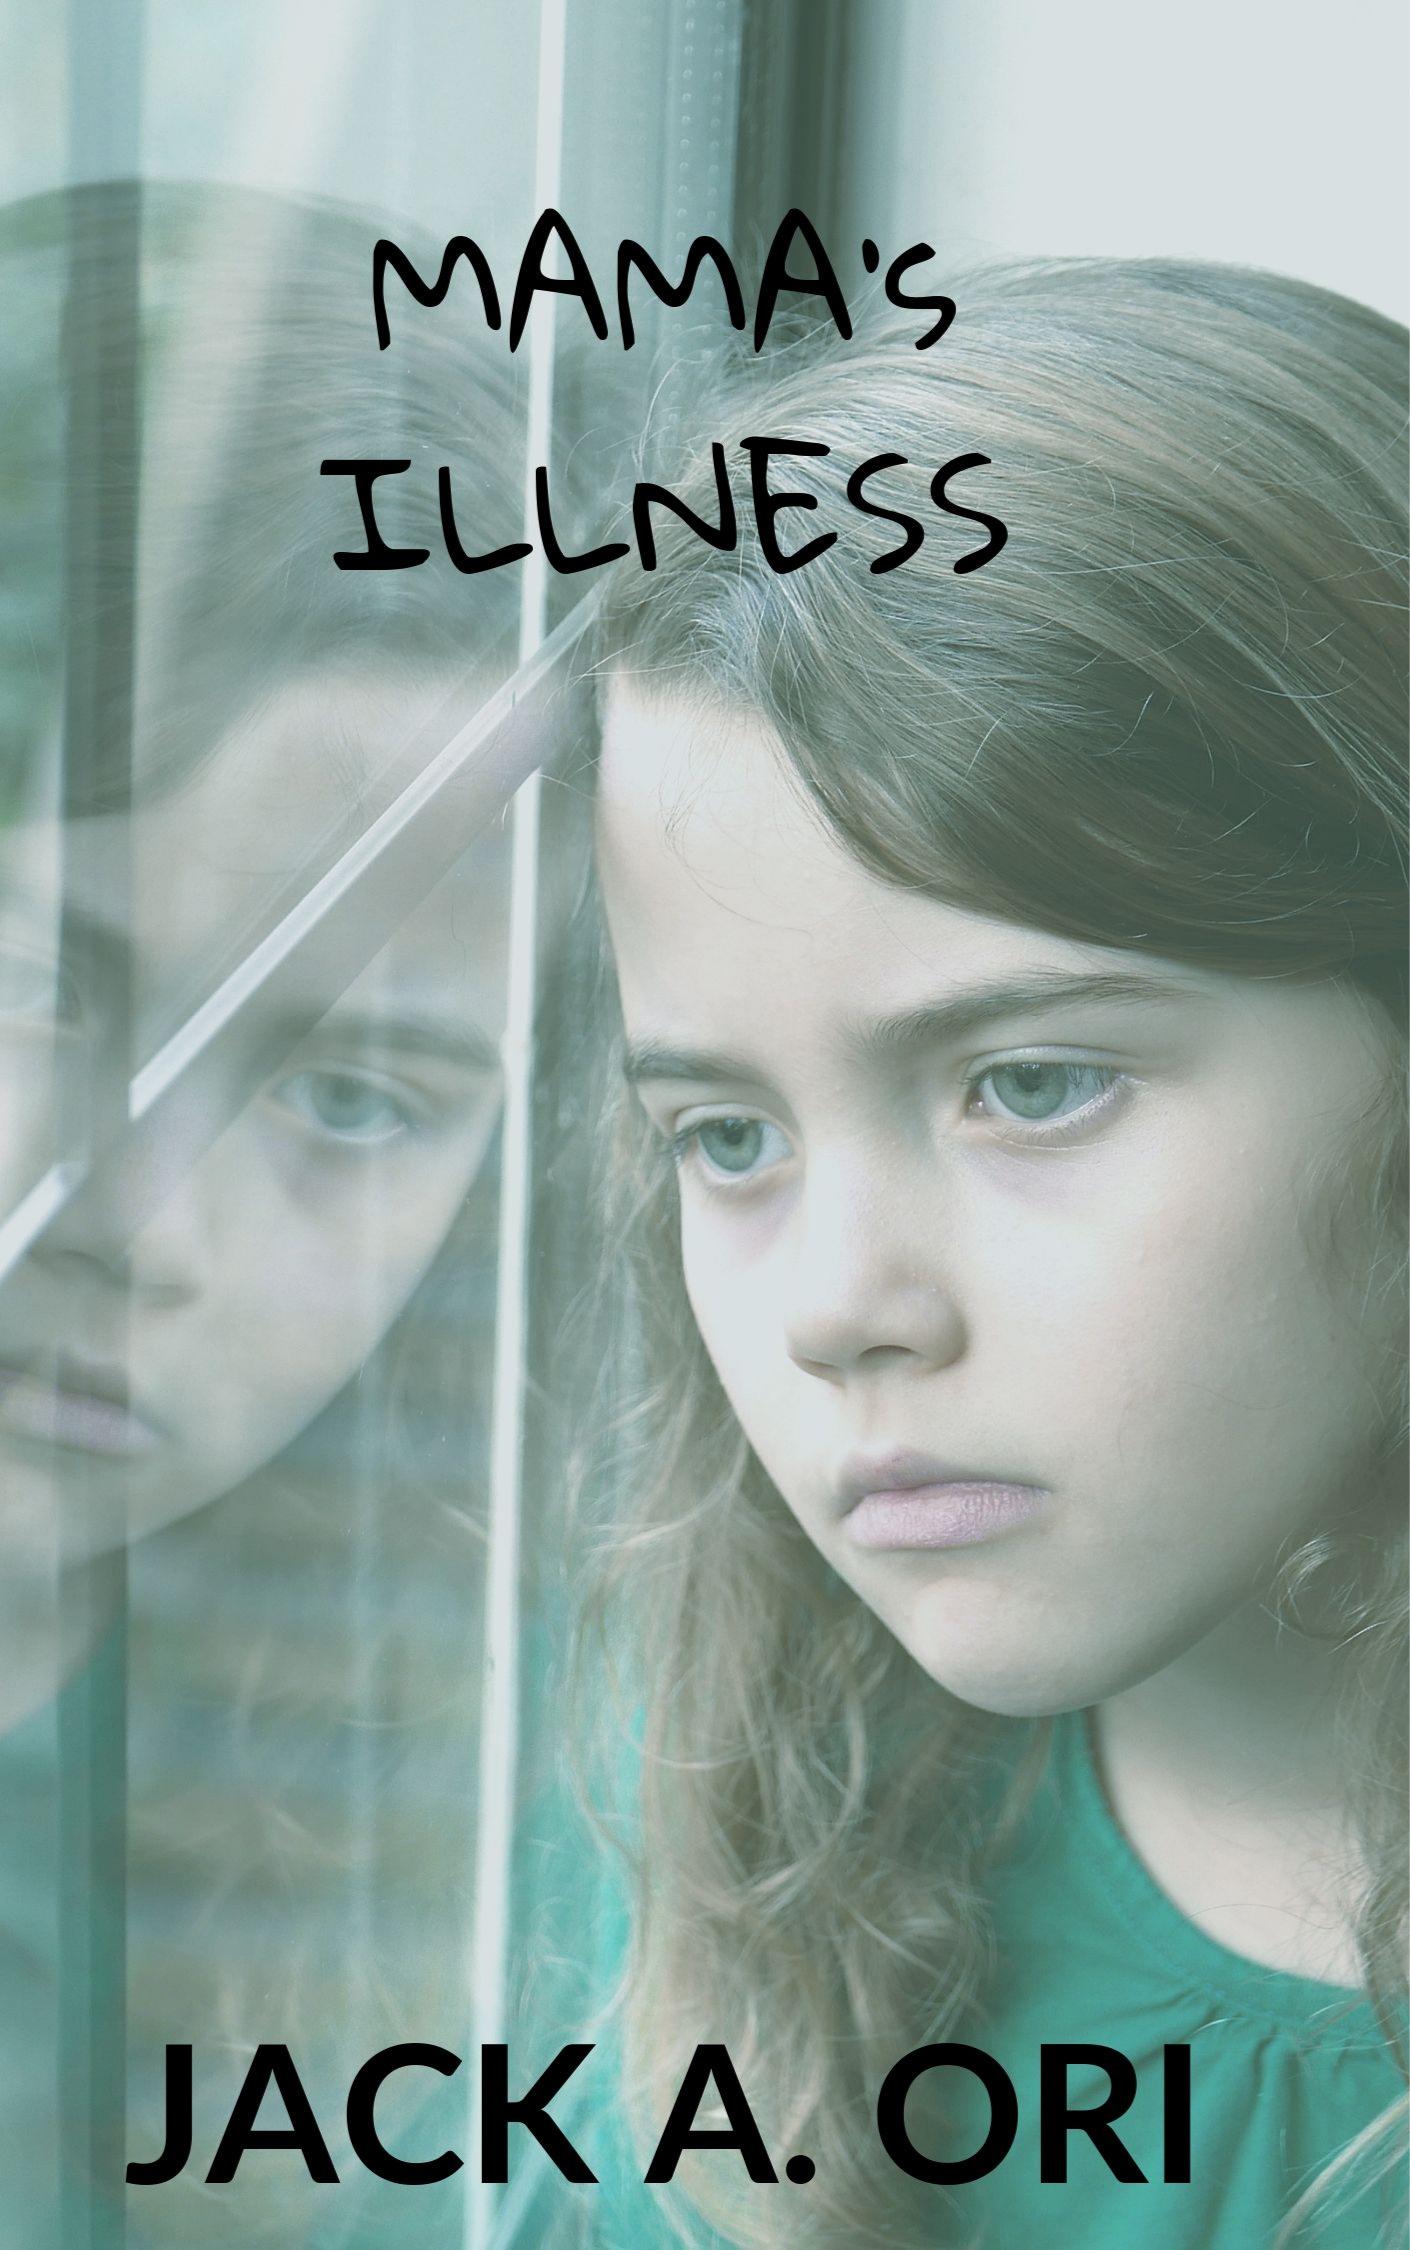 mama's illness cover